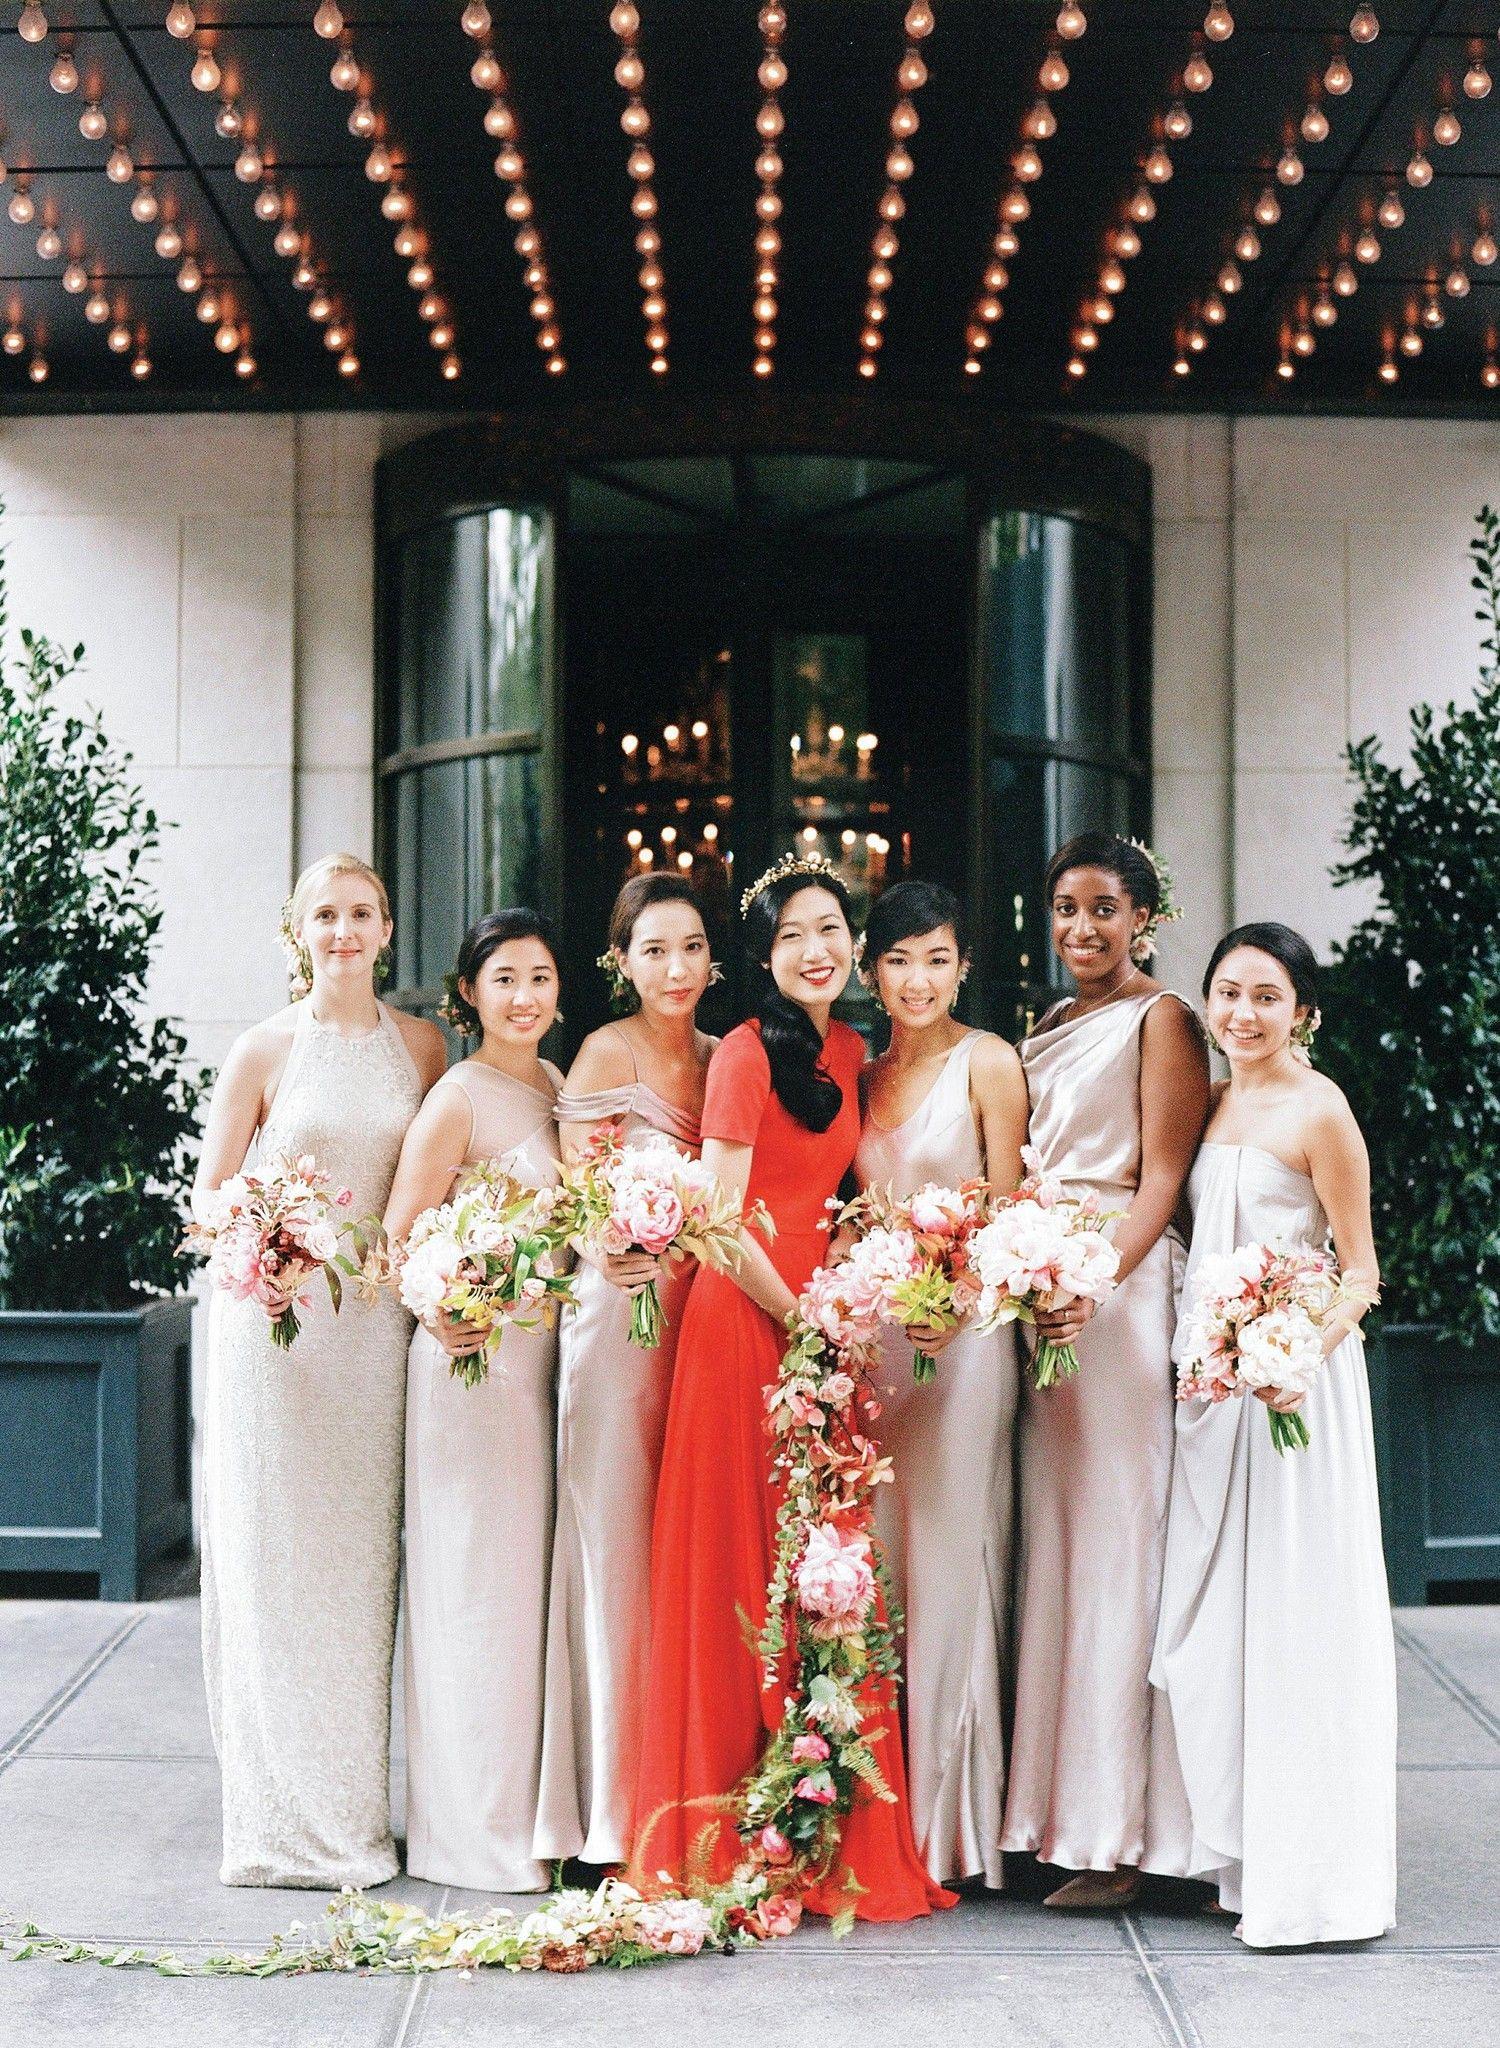 28 Half-Up, Half-Down Wedding Hairstyles We Love